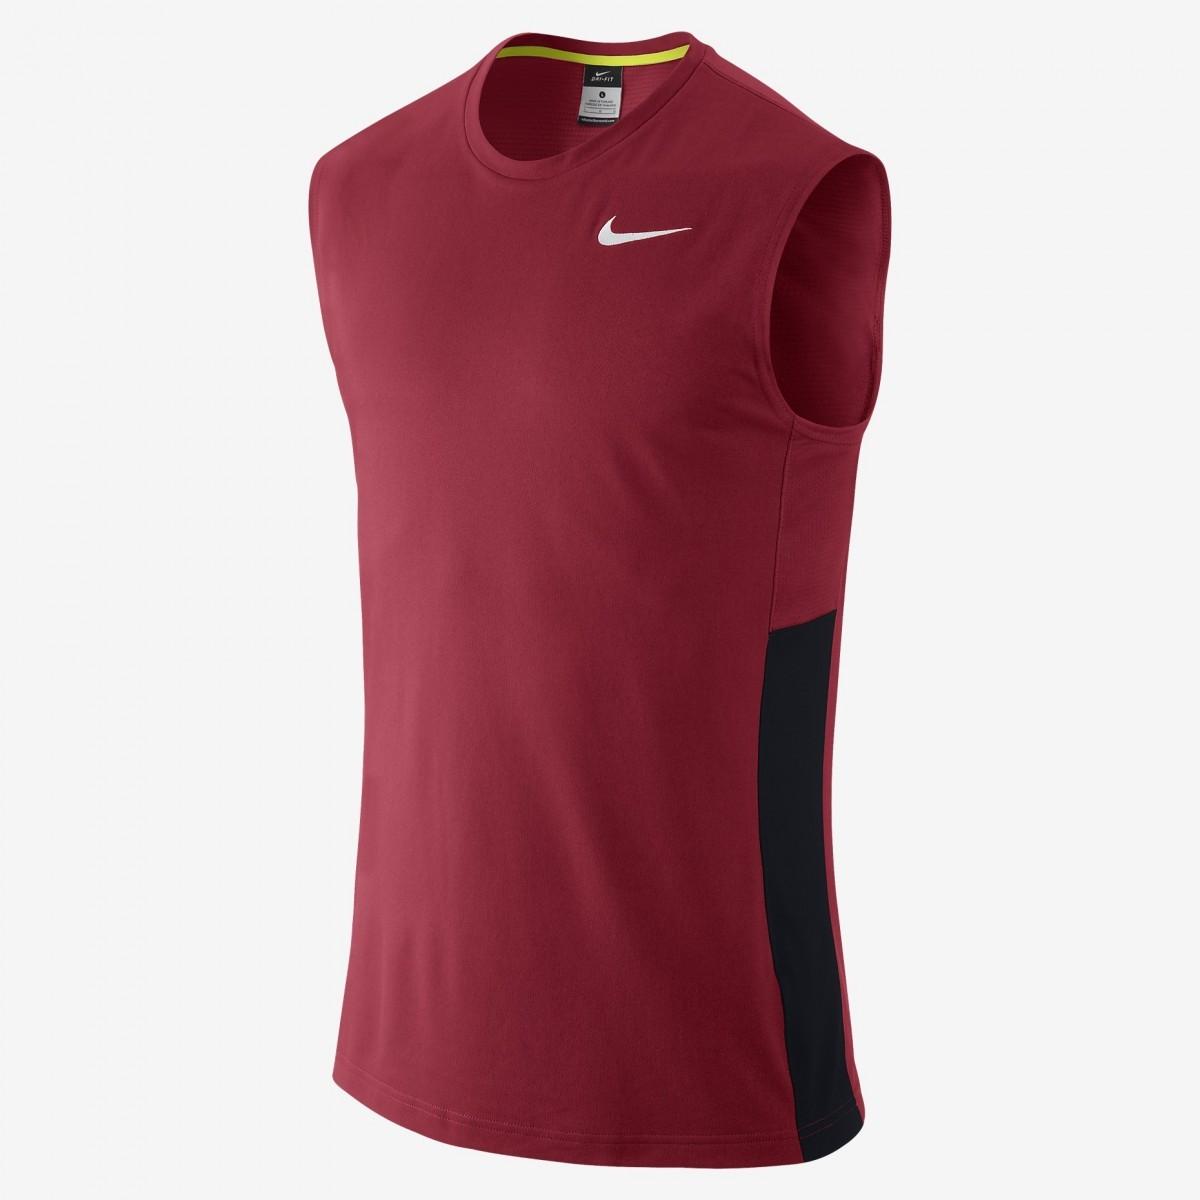 df54e2223abef Bizz Store - Regata Masculina Nike Crossover Basquete